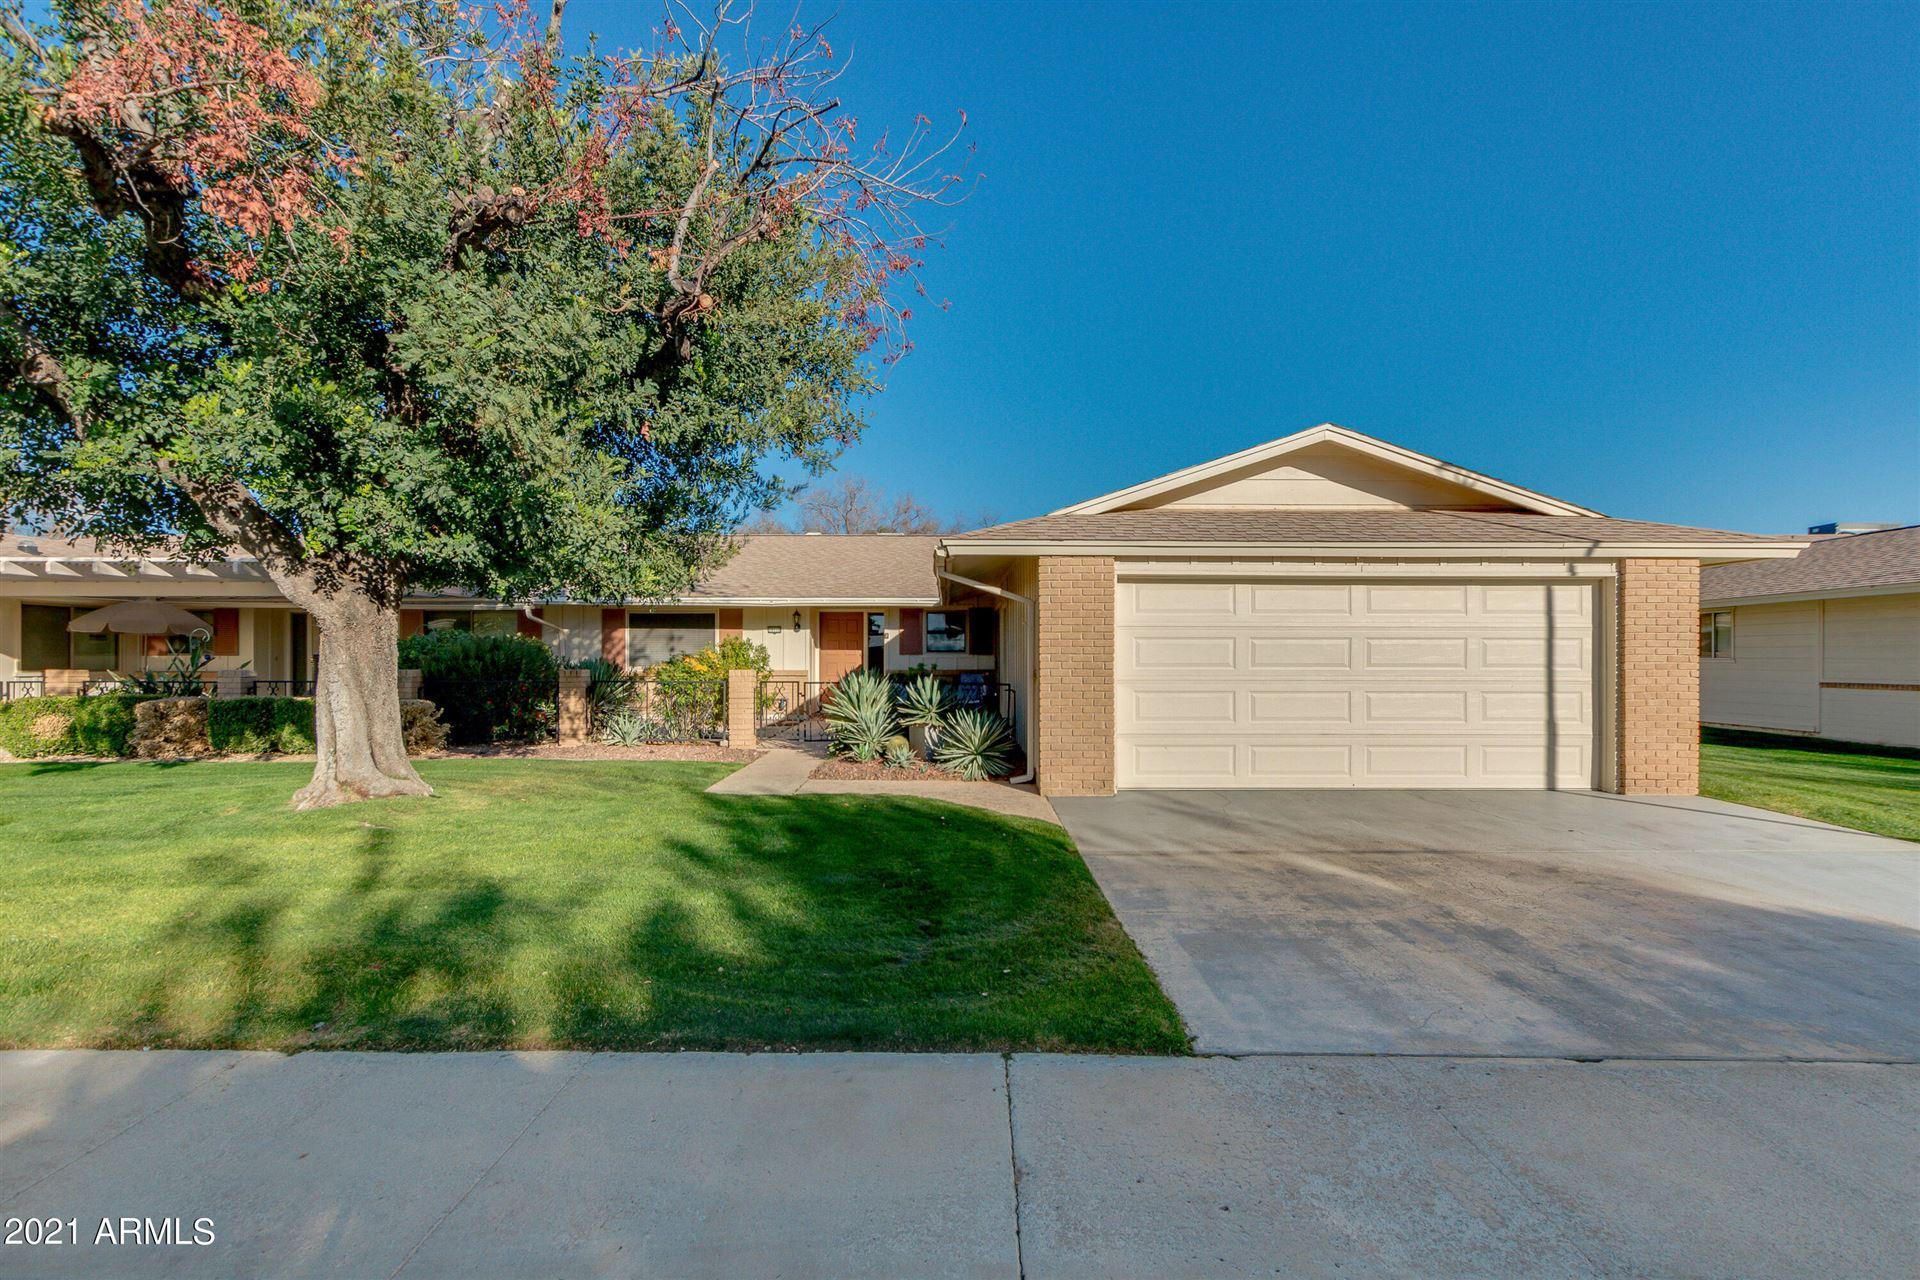 Photo of 10110 W KINGSWOOD Circle, Sun City, AZ 85351 (MLS # 6201583)